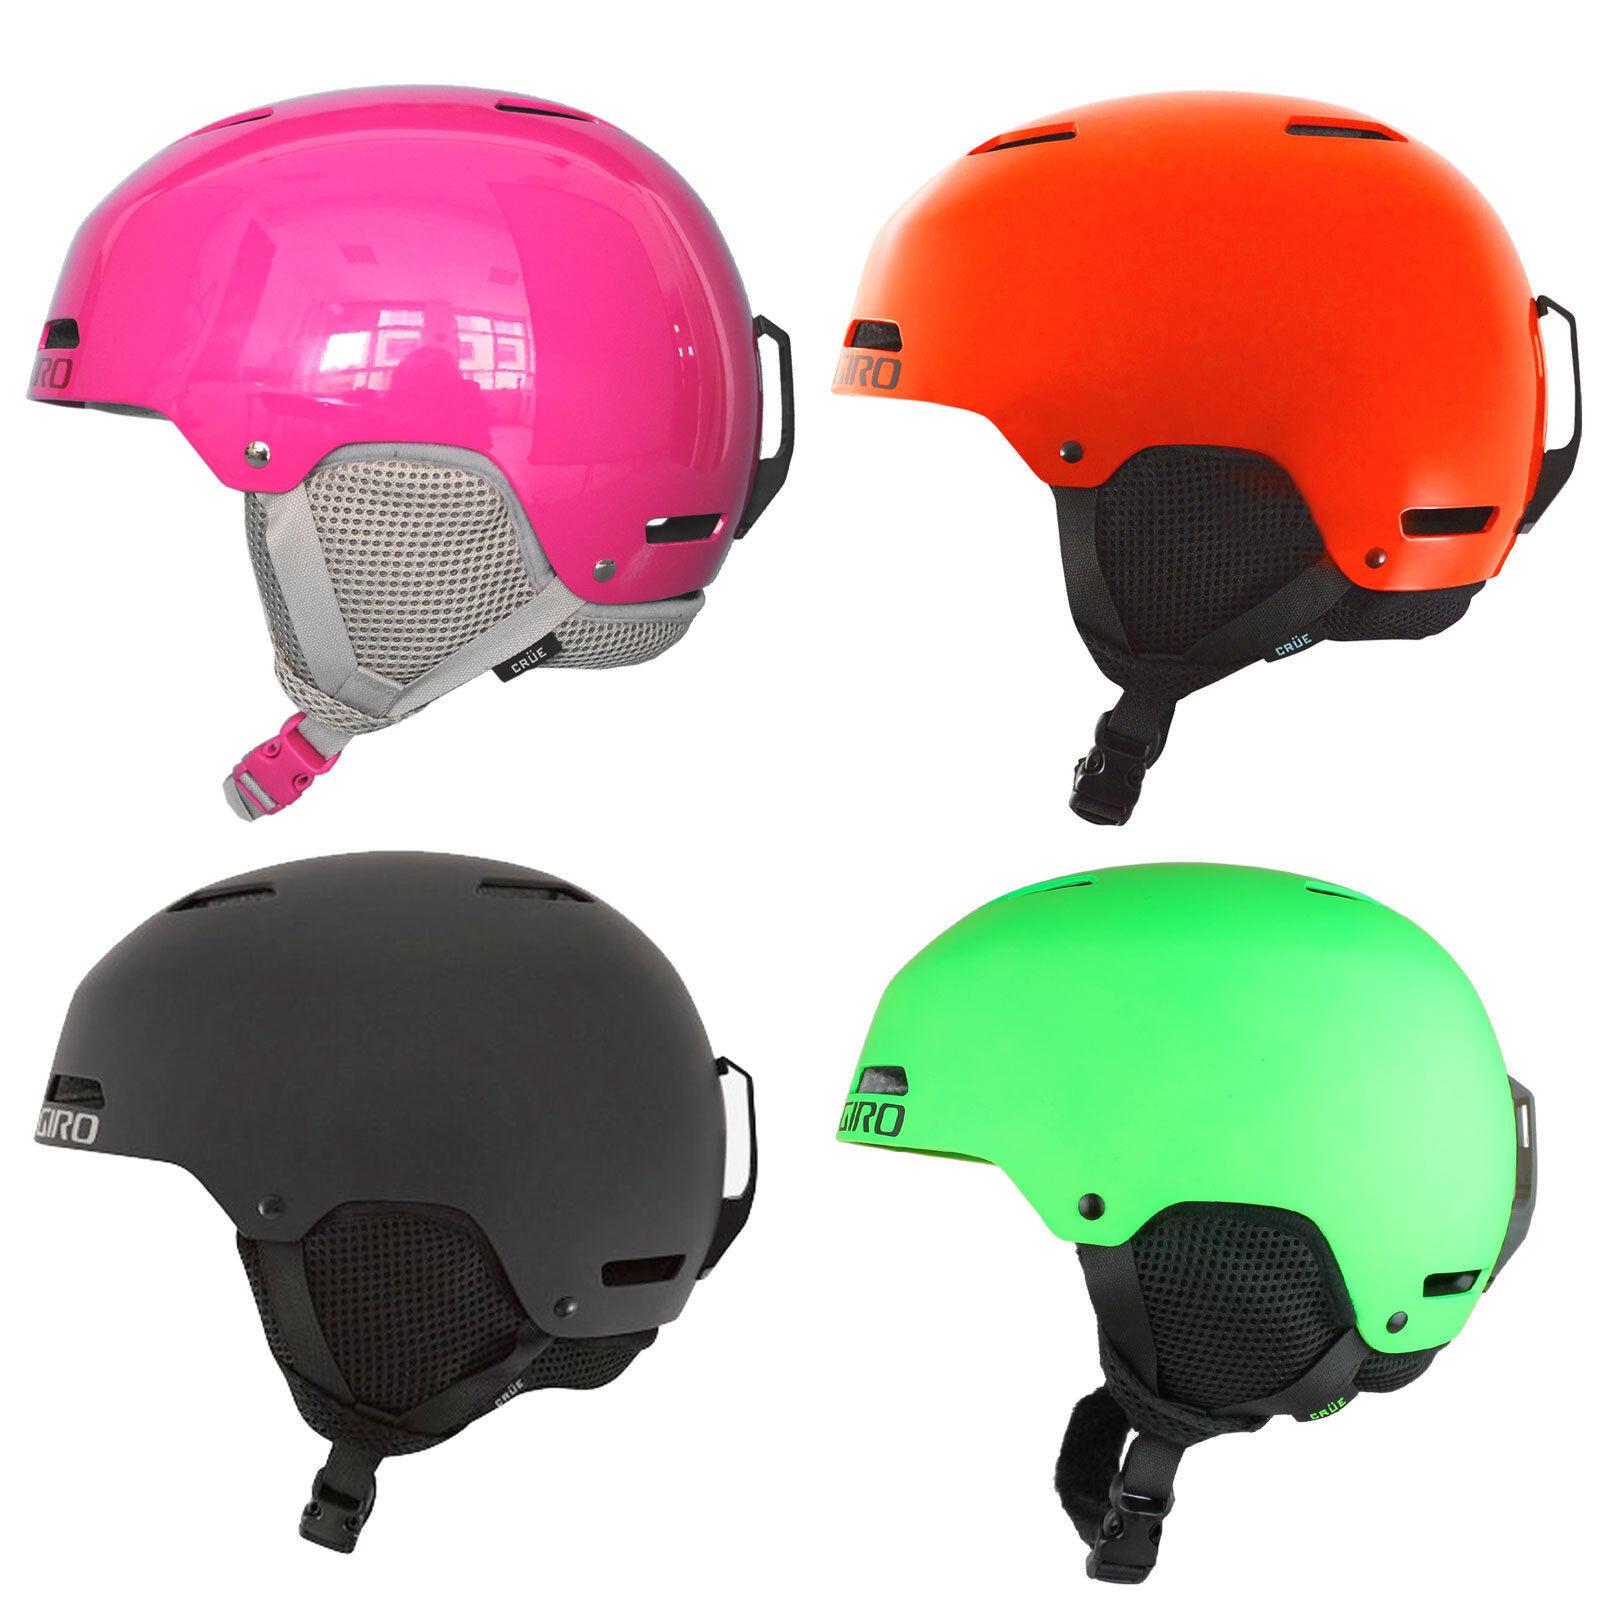 Giro Crue Kinder-Snowboardhelm  Winter Sport Helmet Ski Snowboard Helmet  buy discounts